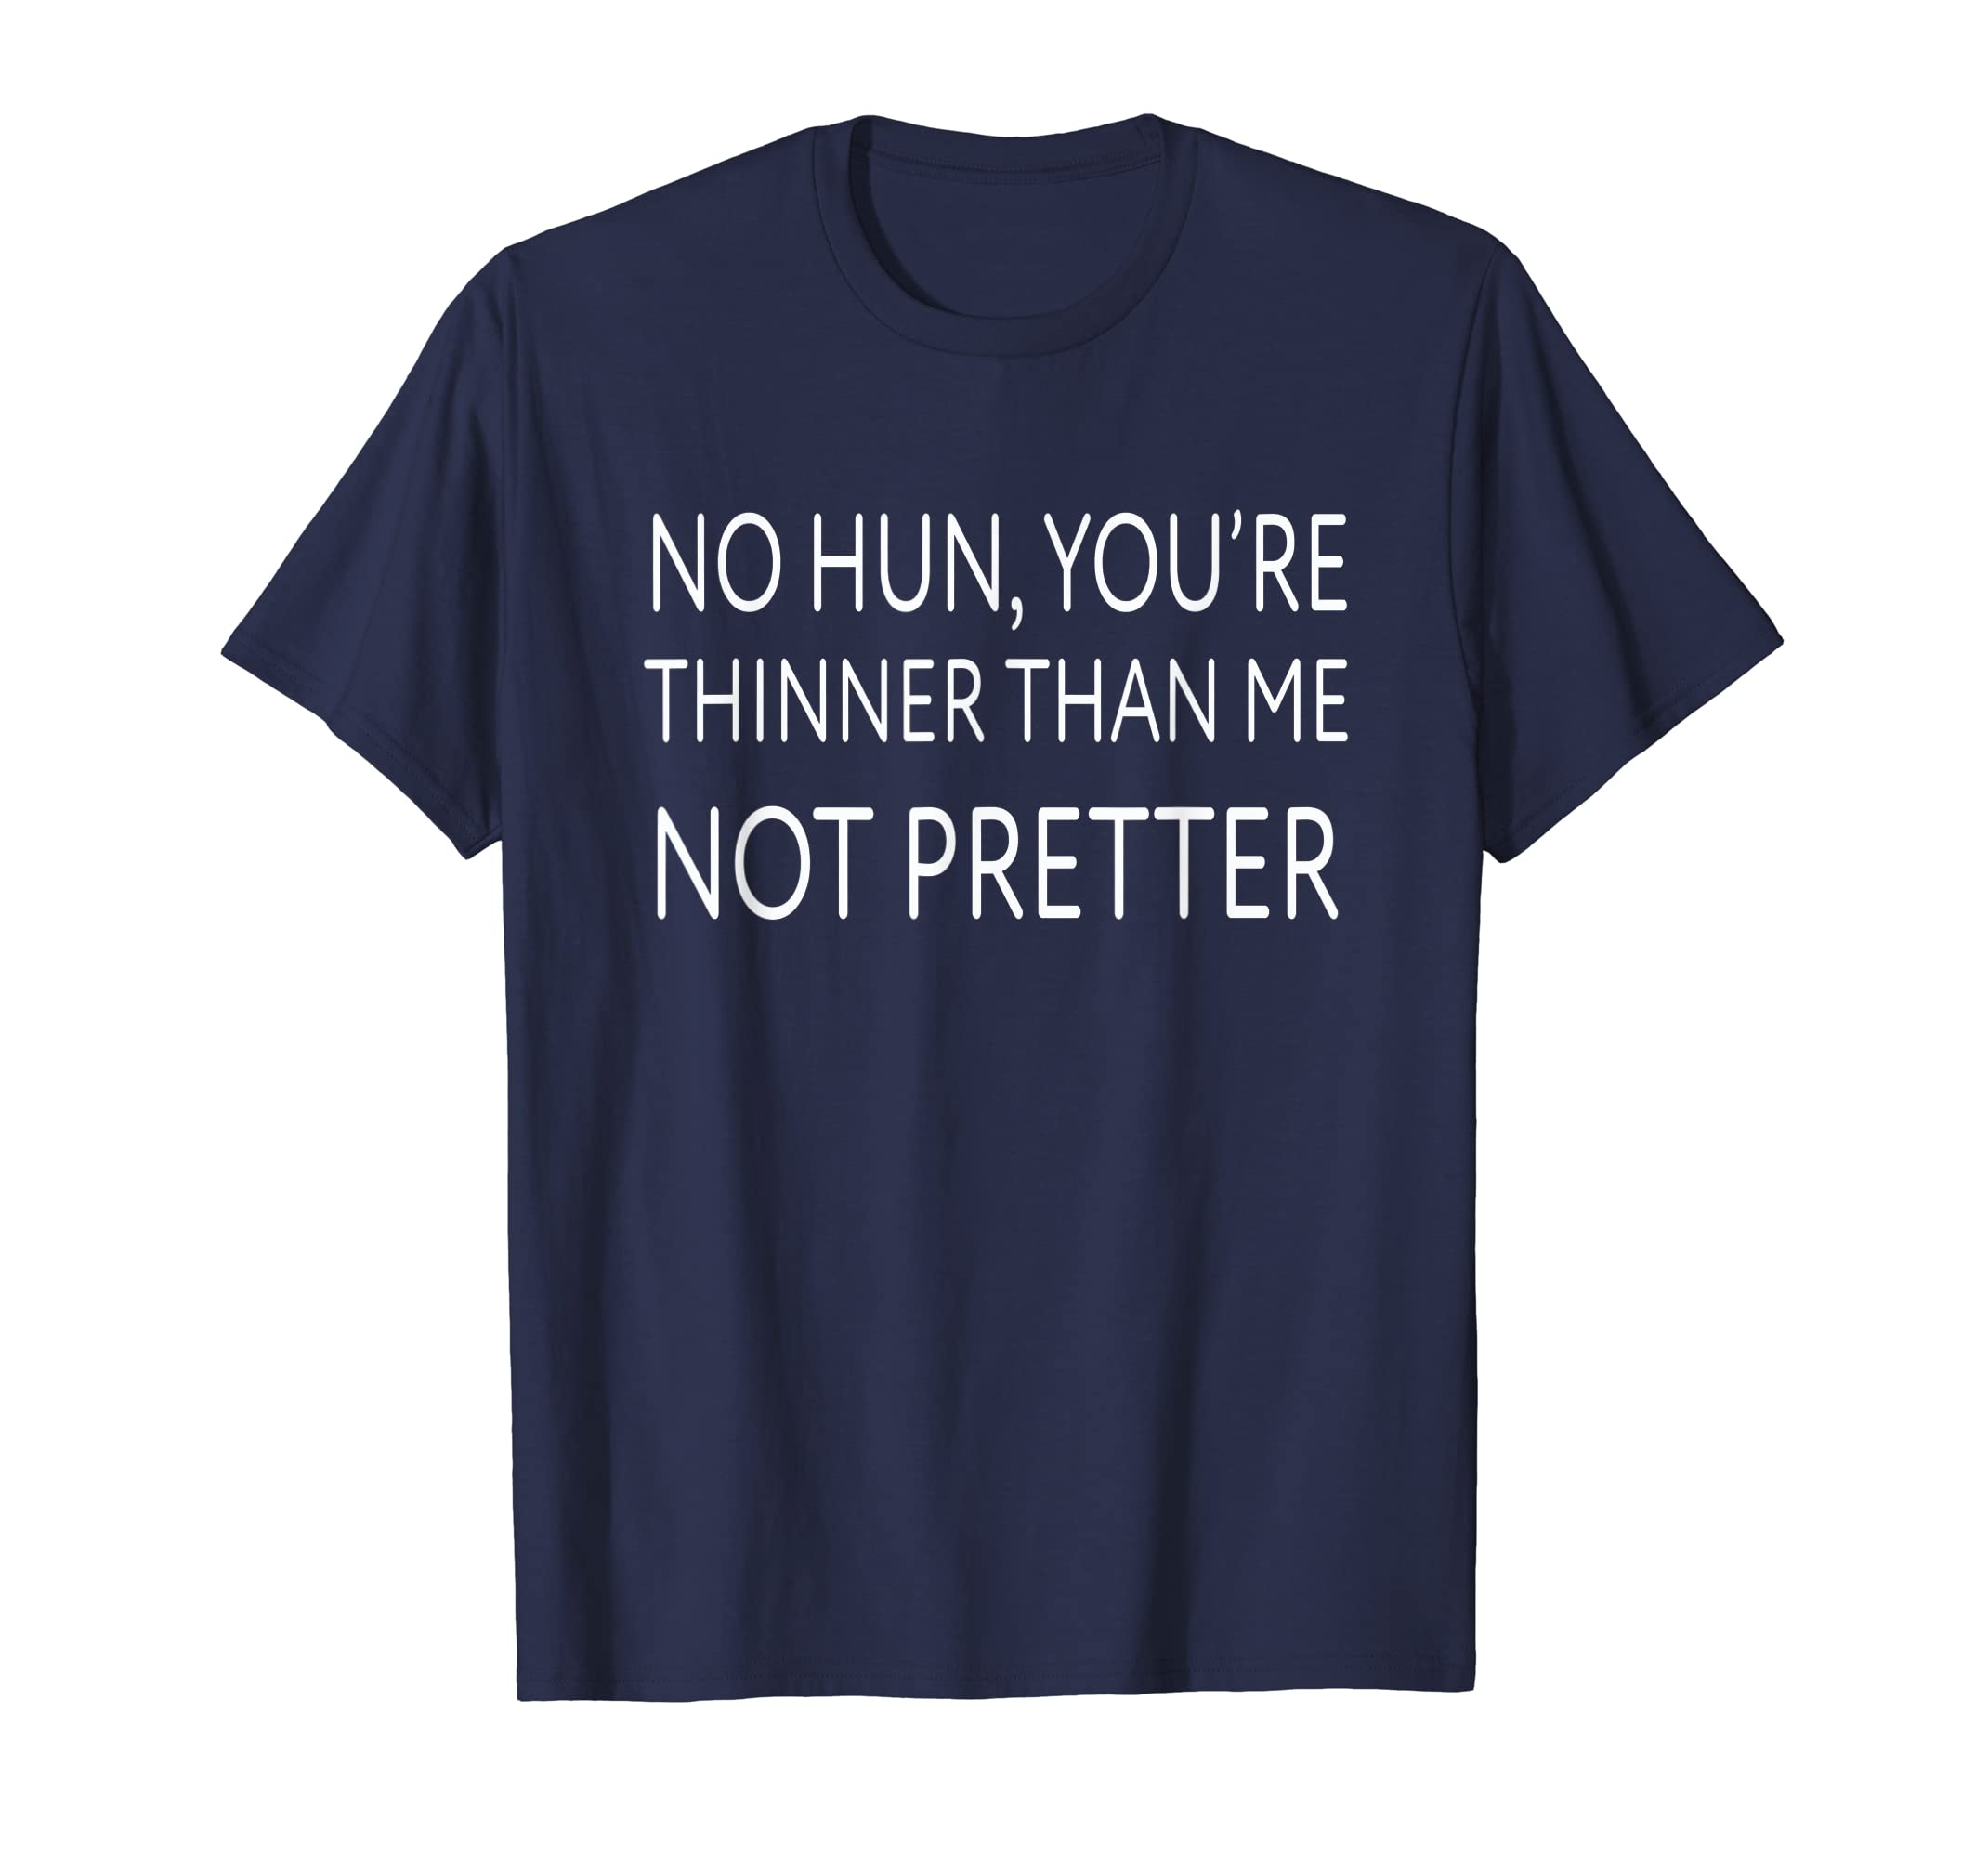 No Hun You're Thinner Than Me Not Pretter T Shirt-Teehay